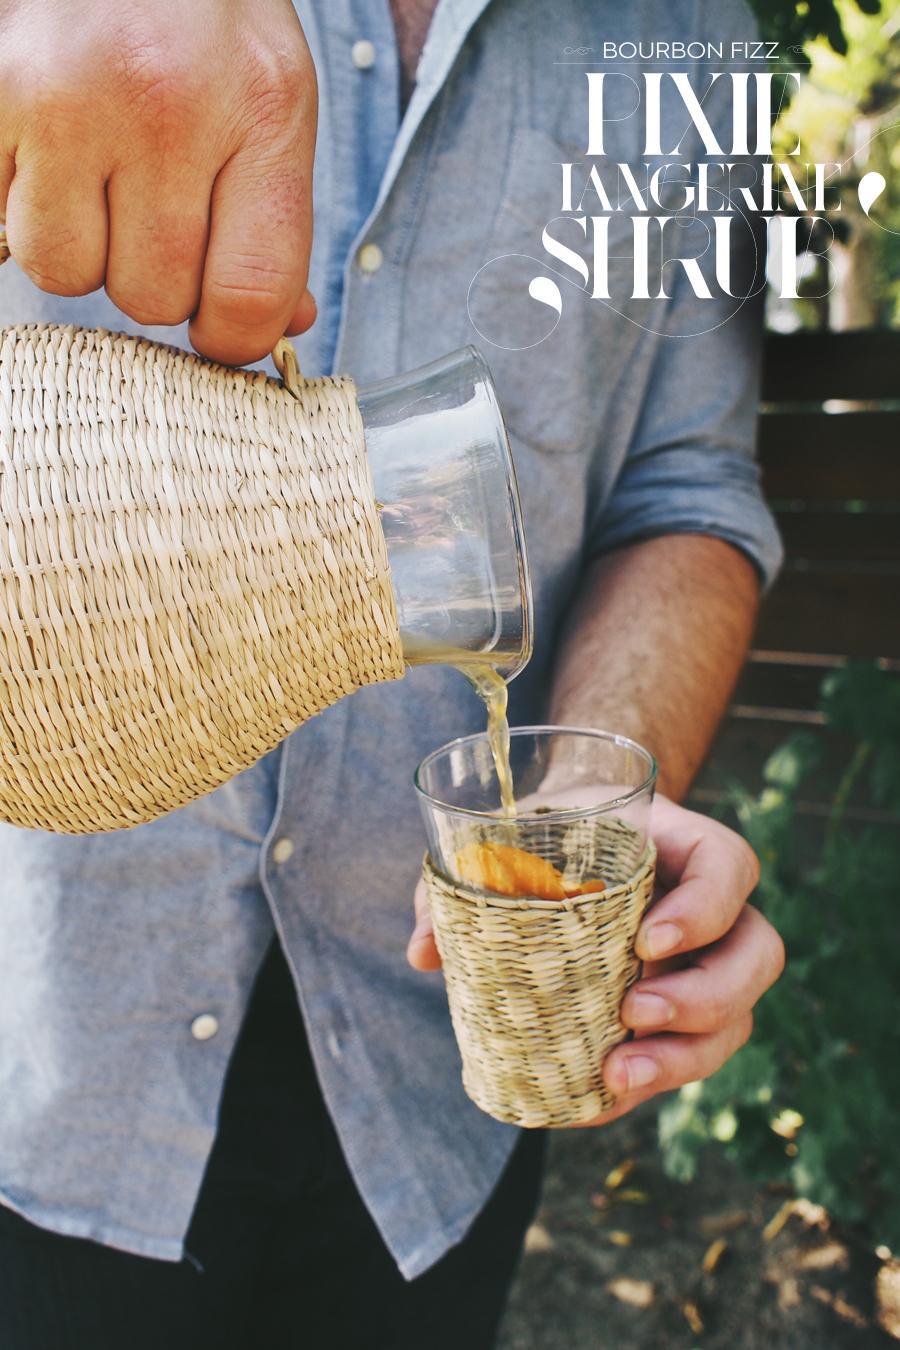 Bourbon Fizz Cocktail With Pixie Tangerine Shrub | Dine X Design